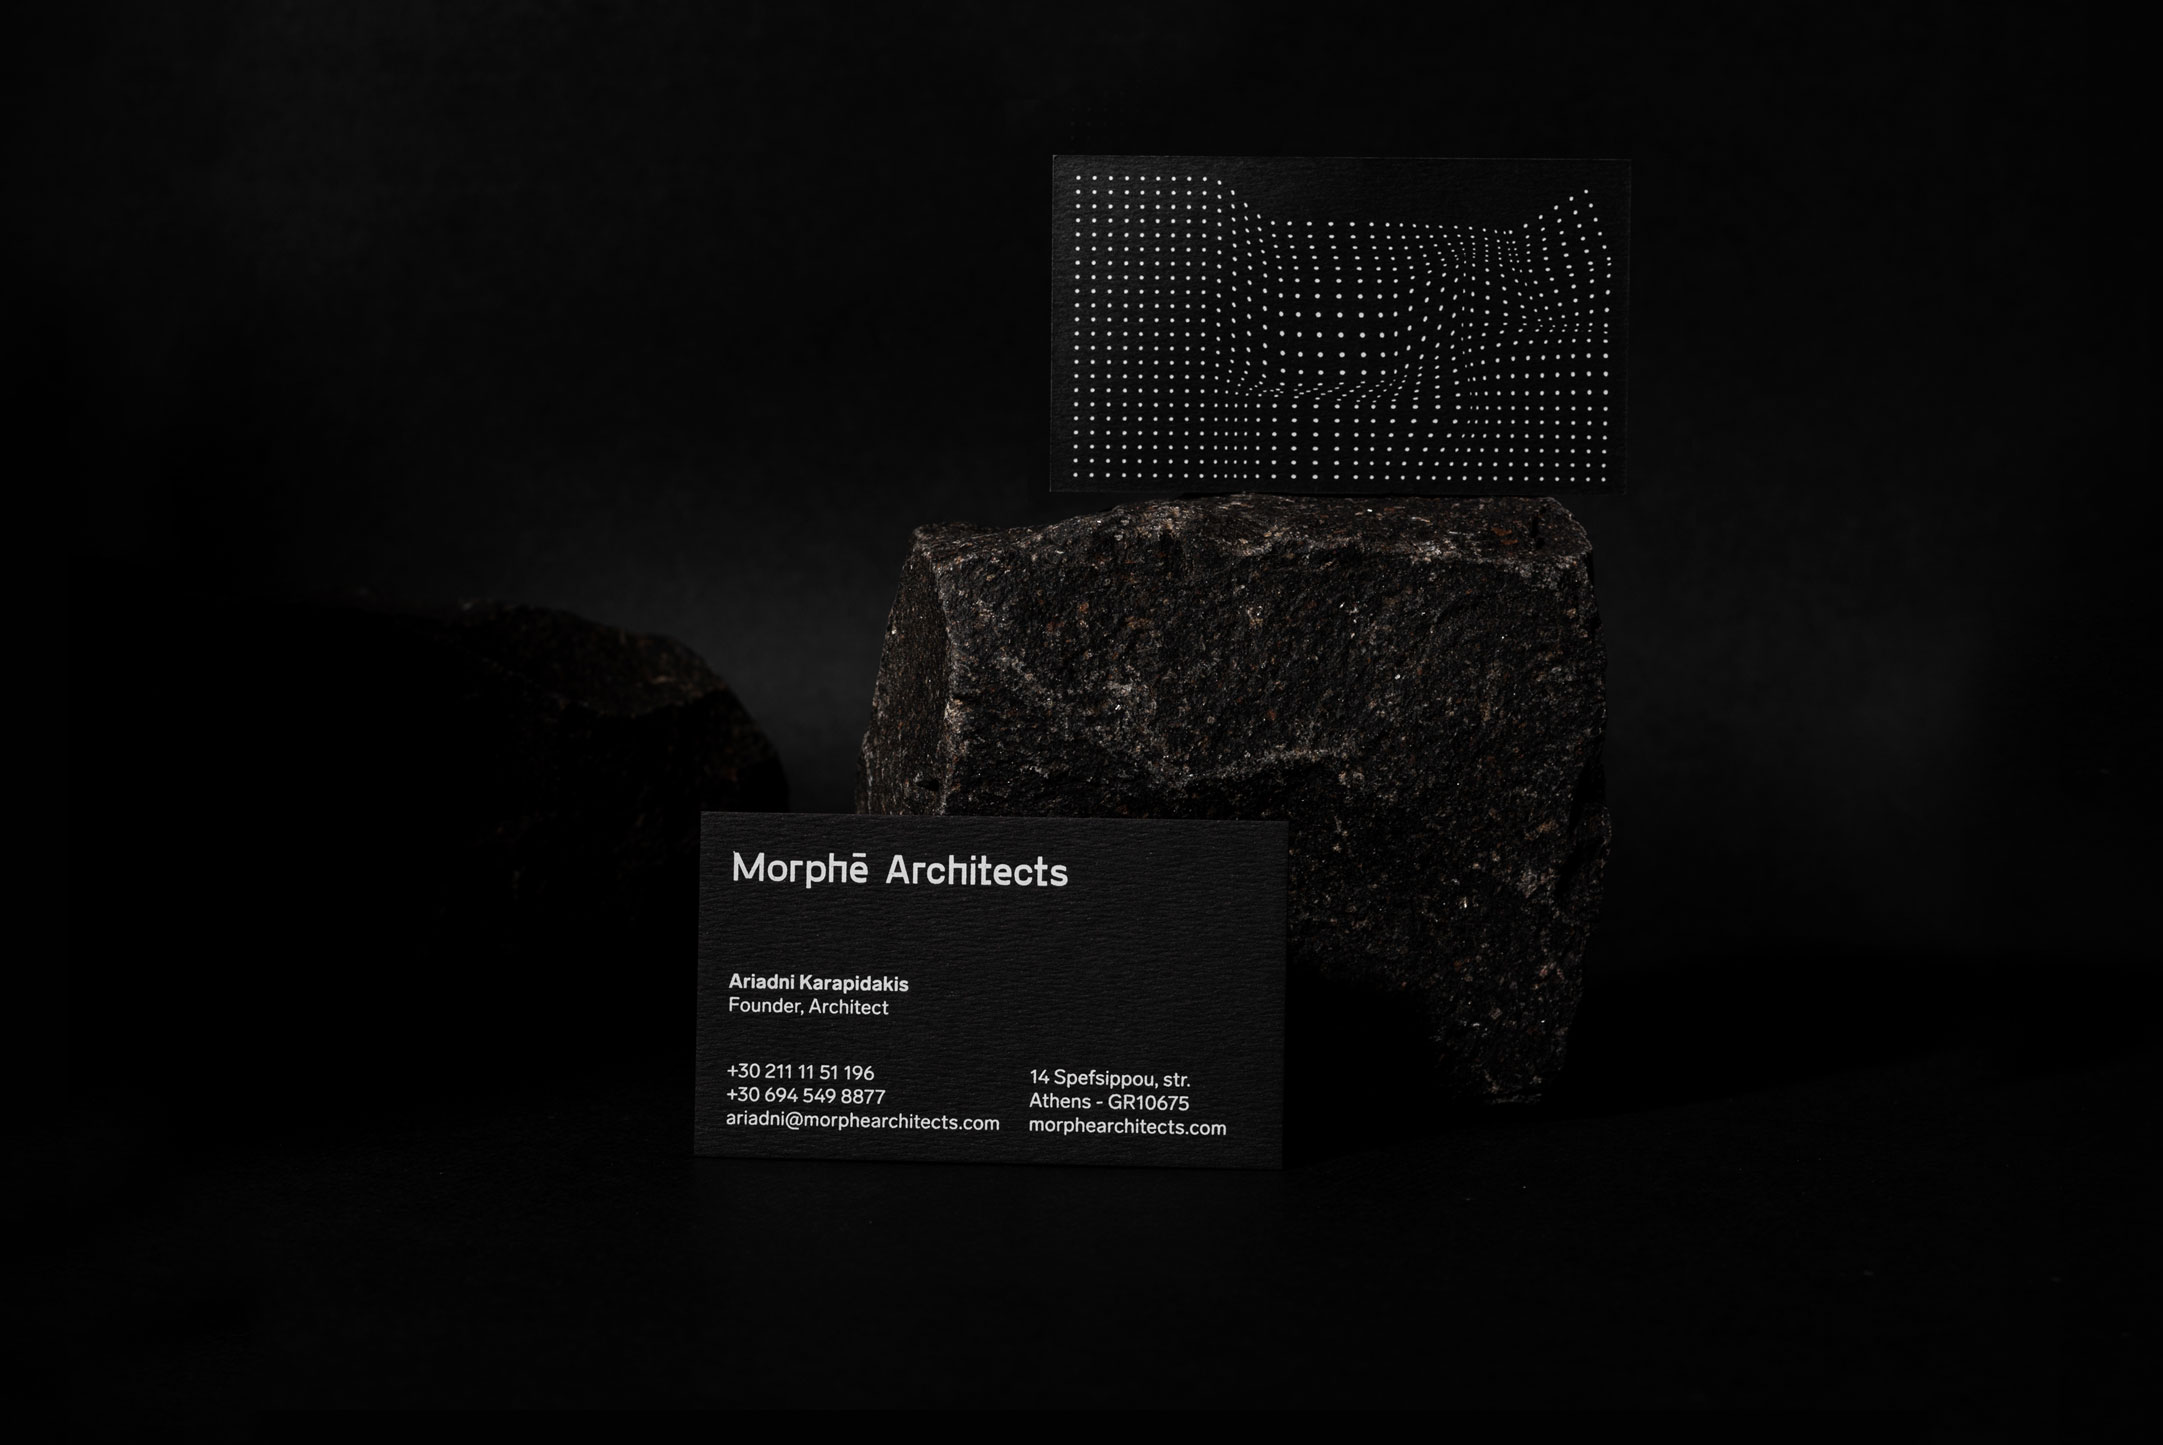 Morphē Architects Identity Design Created by Faze Design Studio